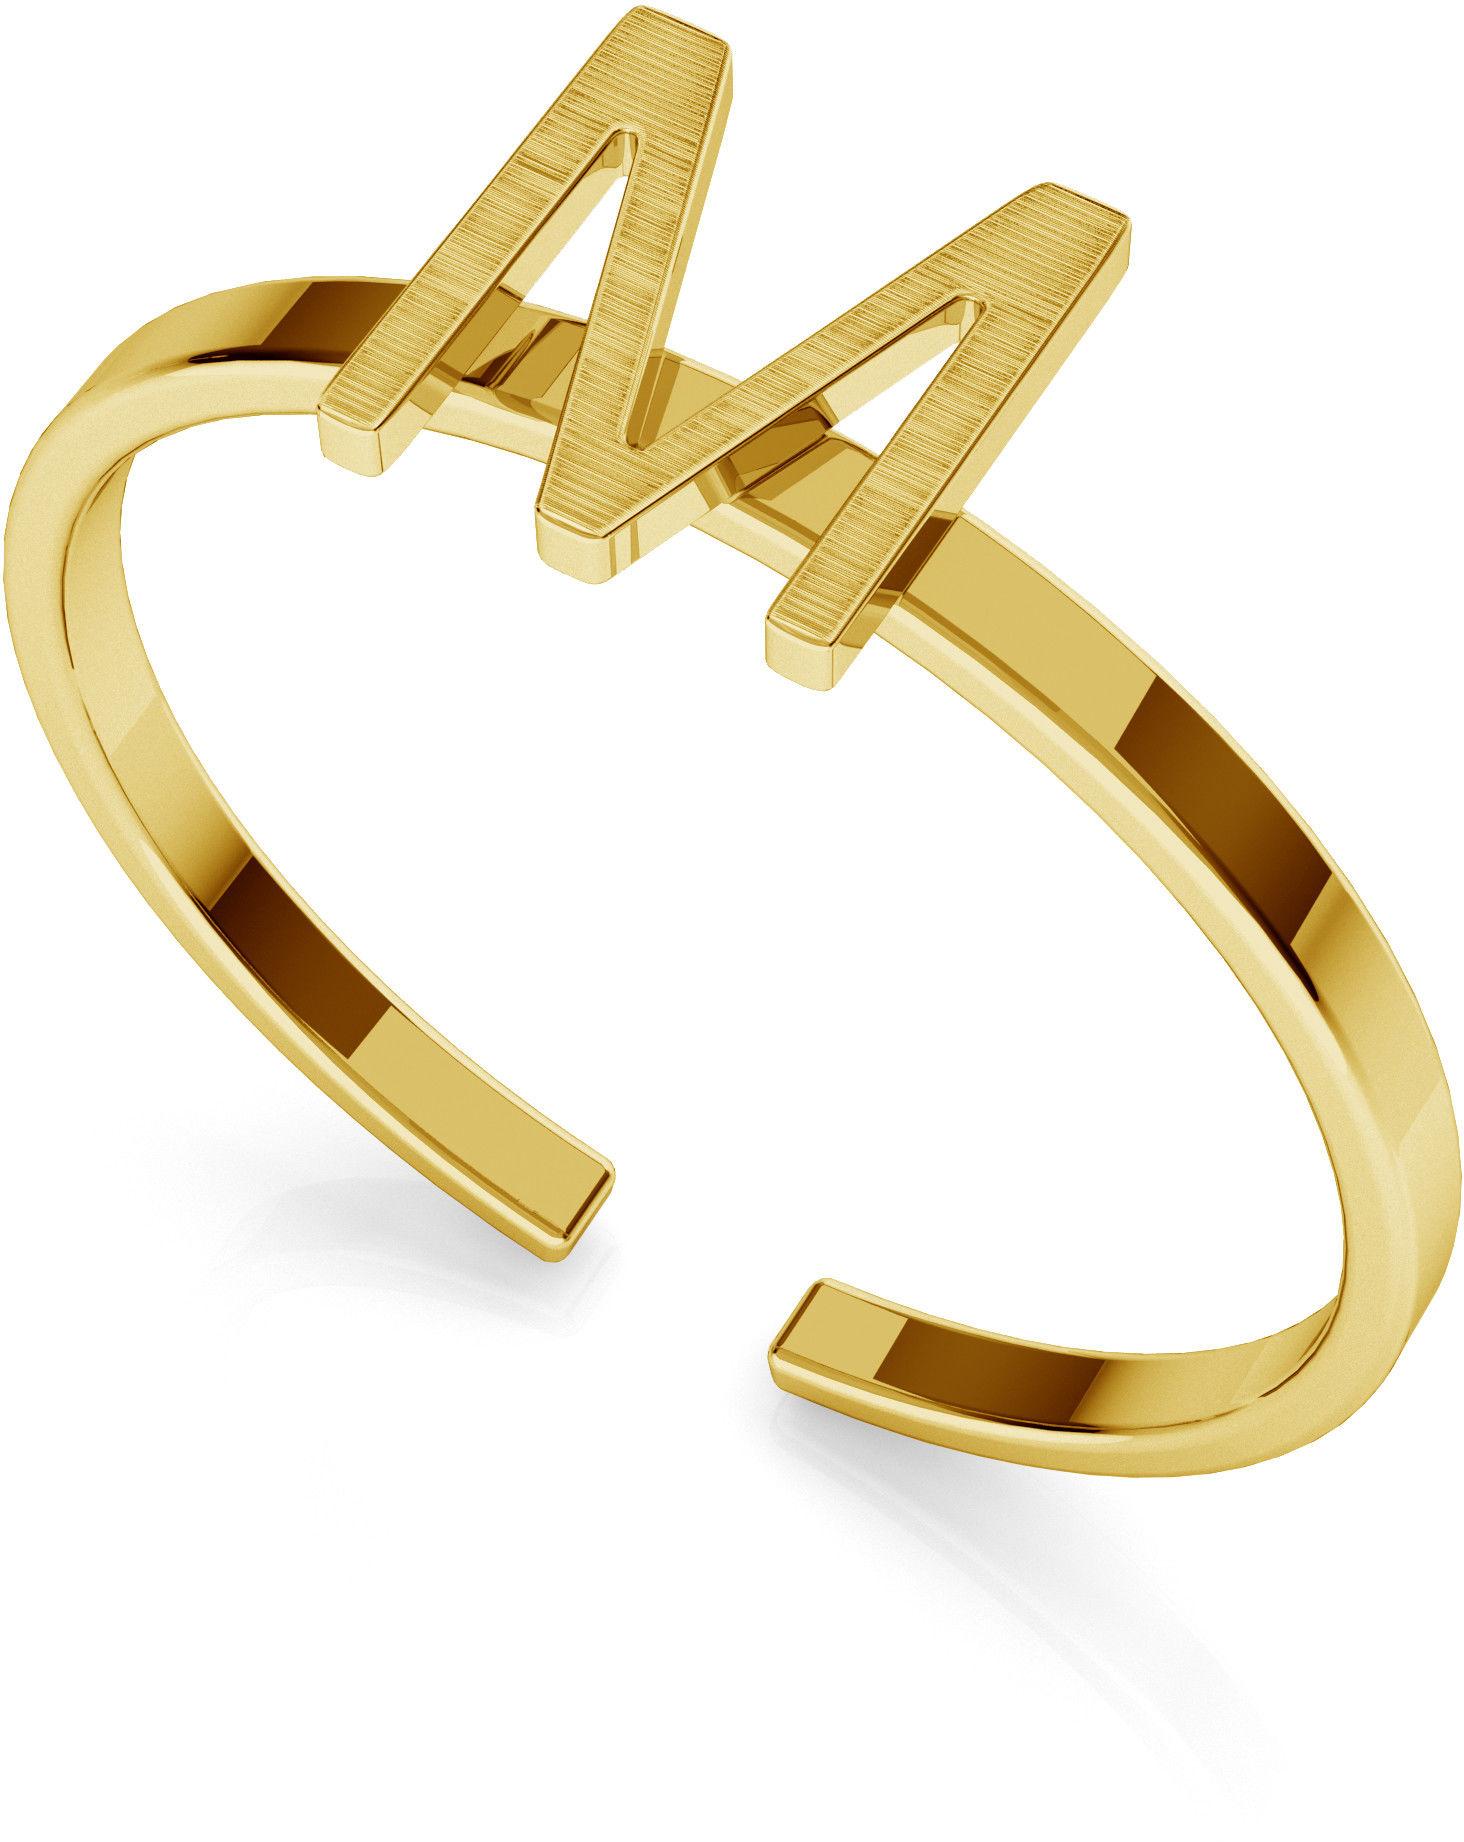 Srebrny pierścionek z literką My RING, srebro 925 : Litera - D, Srebro - kolor pokrycia - Pokrycie platyną